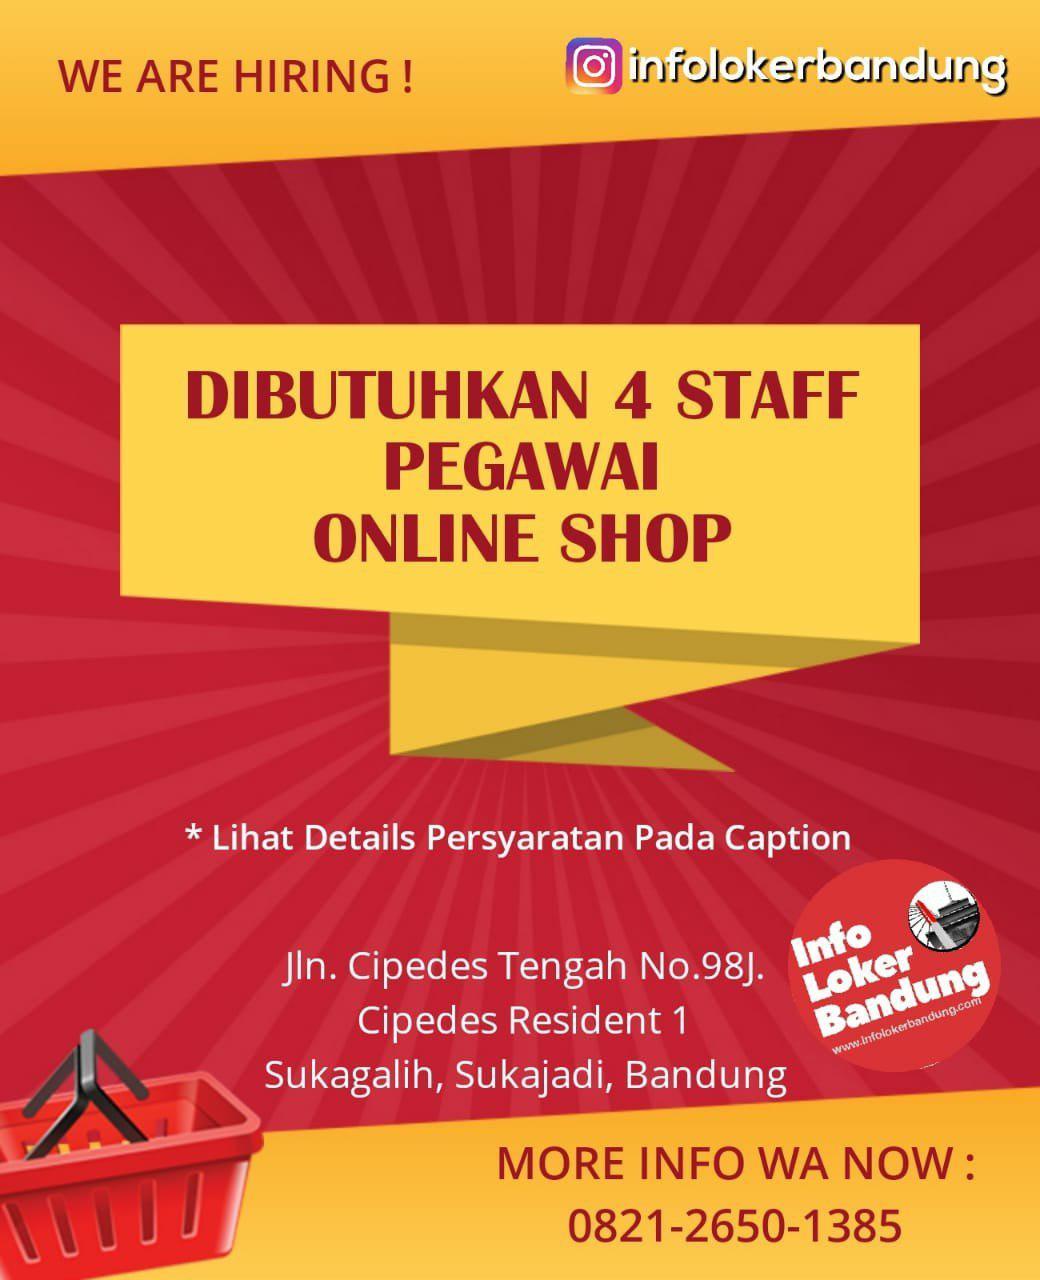 Lowongan Kerja 4 Staff Pegawai Online Shop Bandung Januari 2019